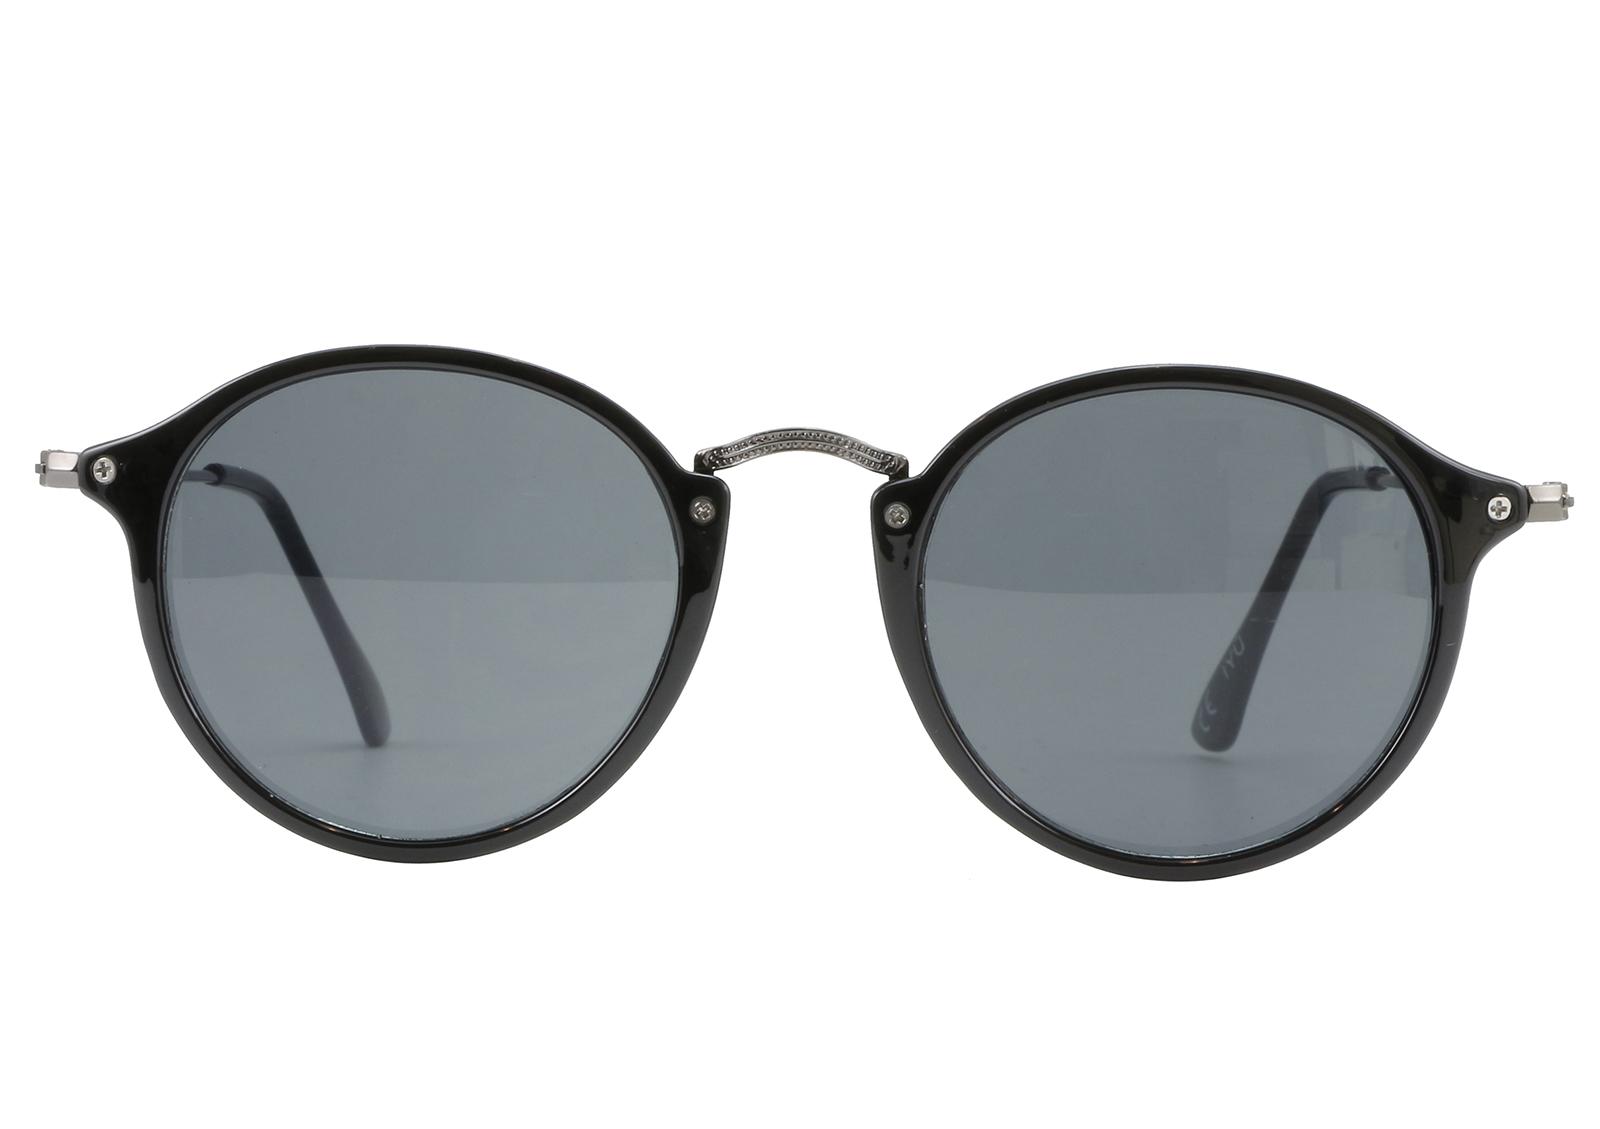 iyu design lentes de sol redondos para hombre color negro yoni noir. Black Bedroom Furniture Sets. Home Design Ideas